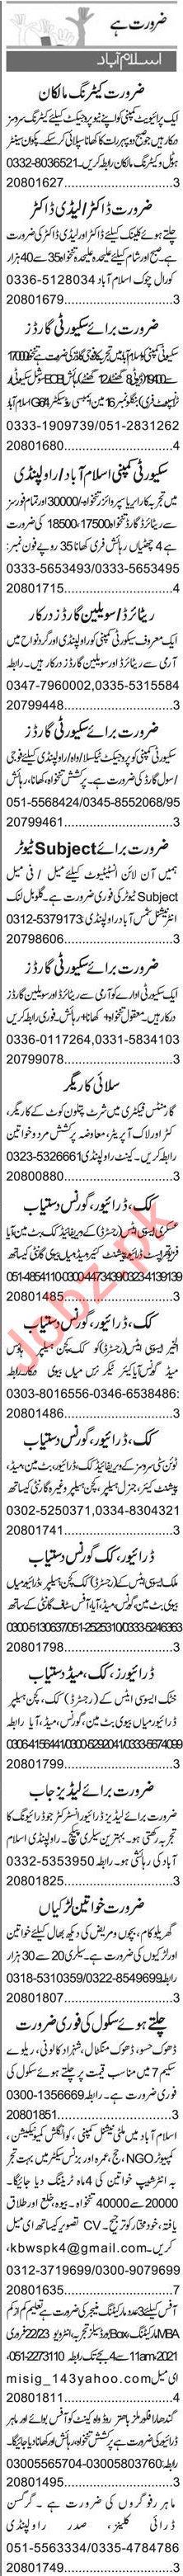 Express Sunday Islamabad Classified Ads 21st Feb 2021